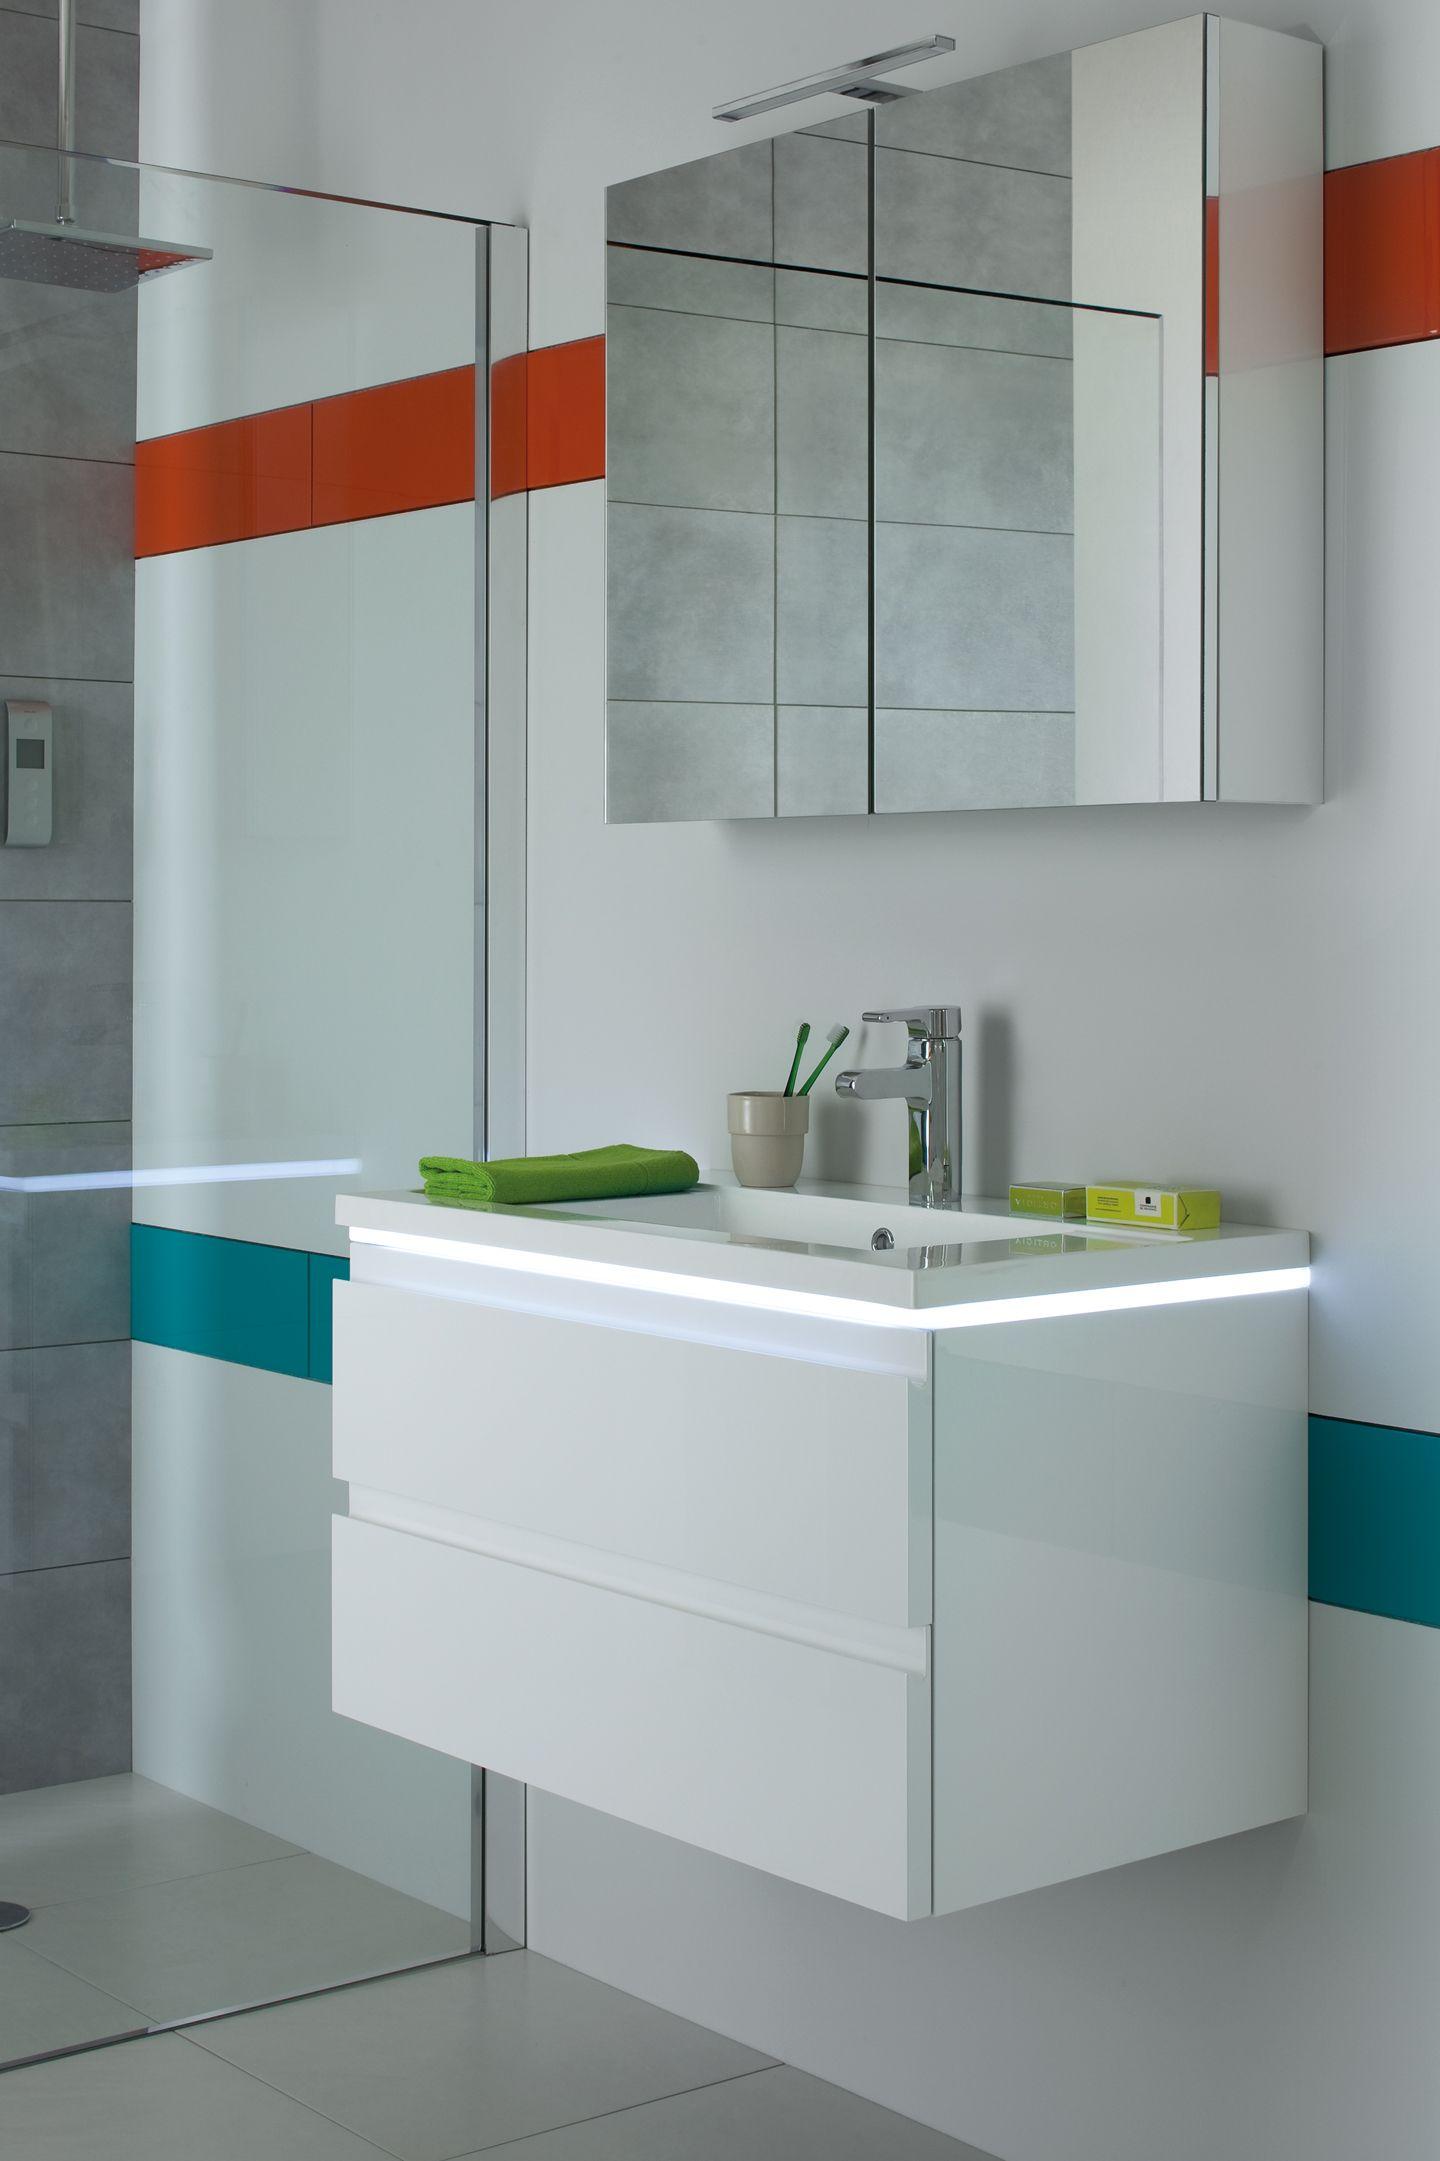 blanc white salledebain bathroom halo sanijura lavabo